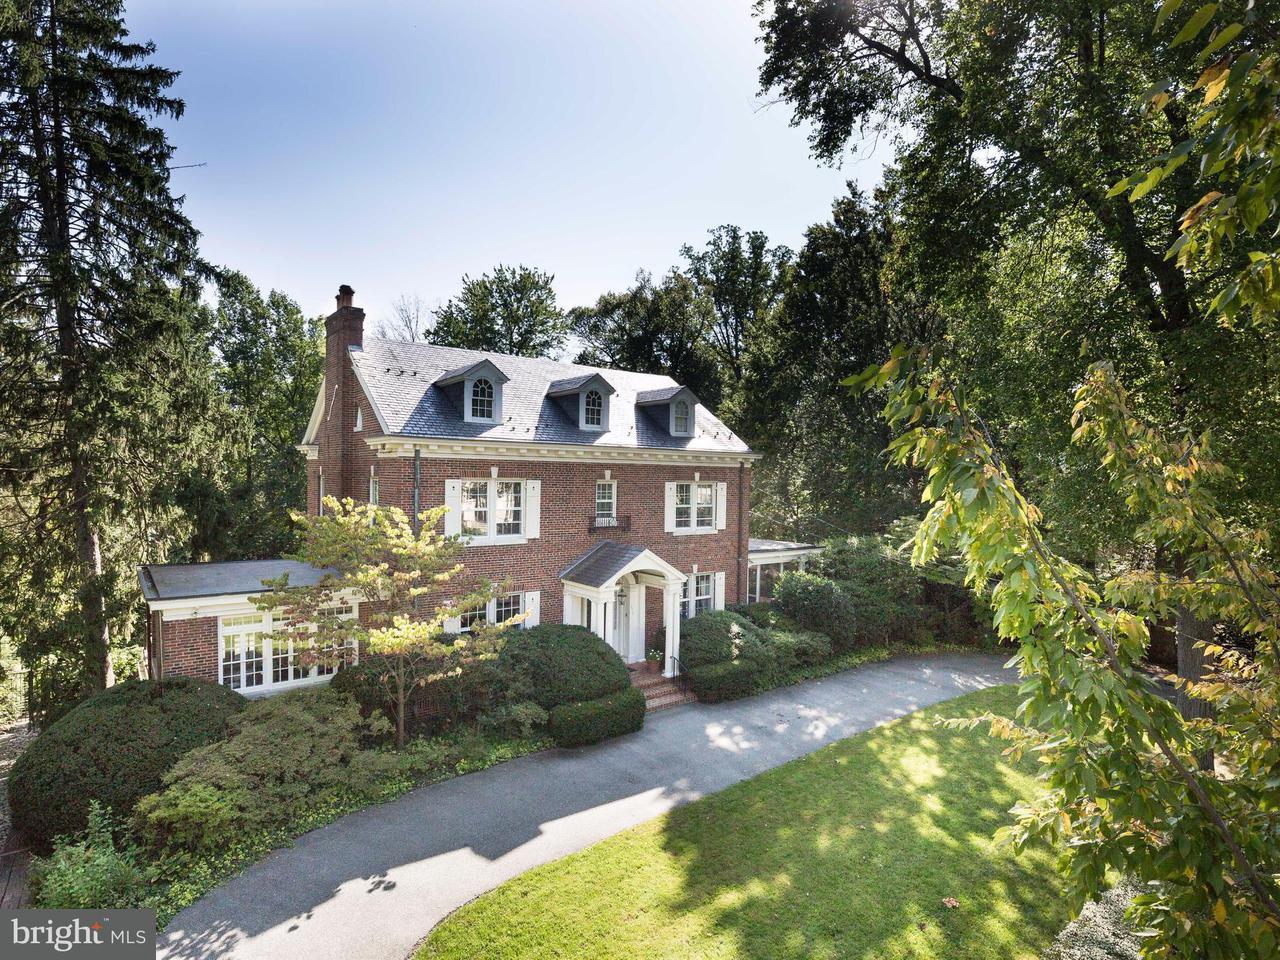 Single Family Home for Sale at 5310 MOORLAND Lane 5310 MOORLAND Lane Bethesda, Maryland 20814 United States